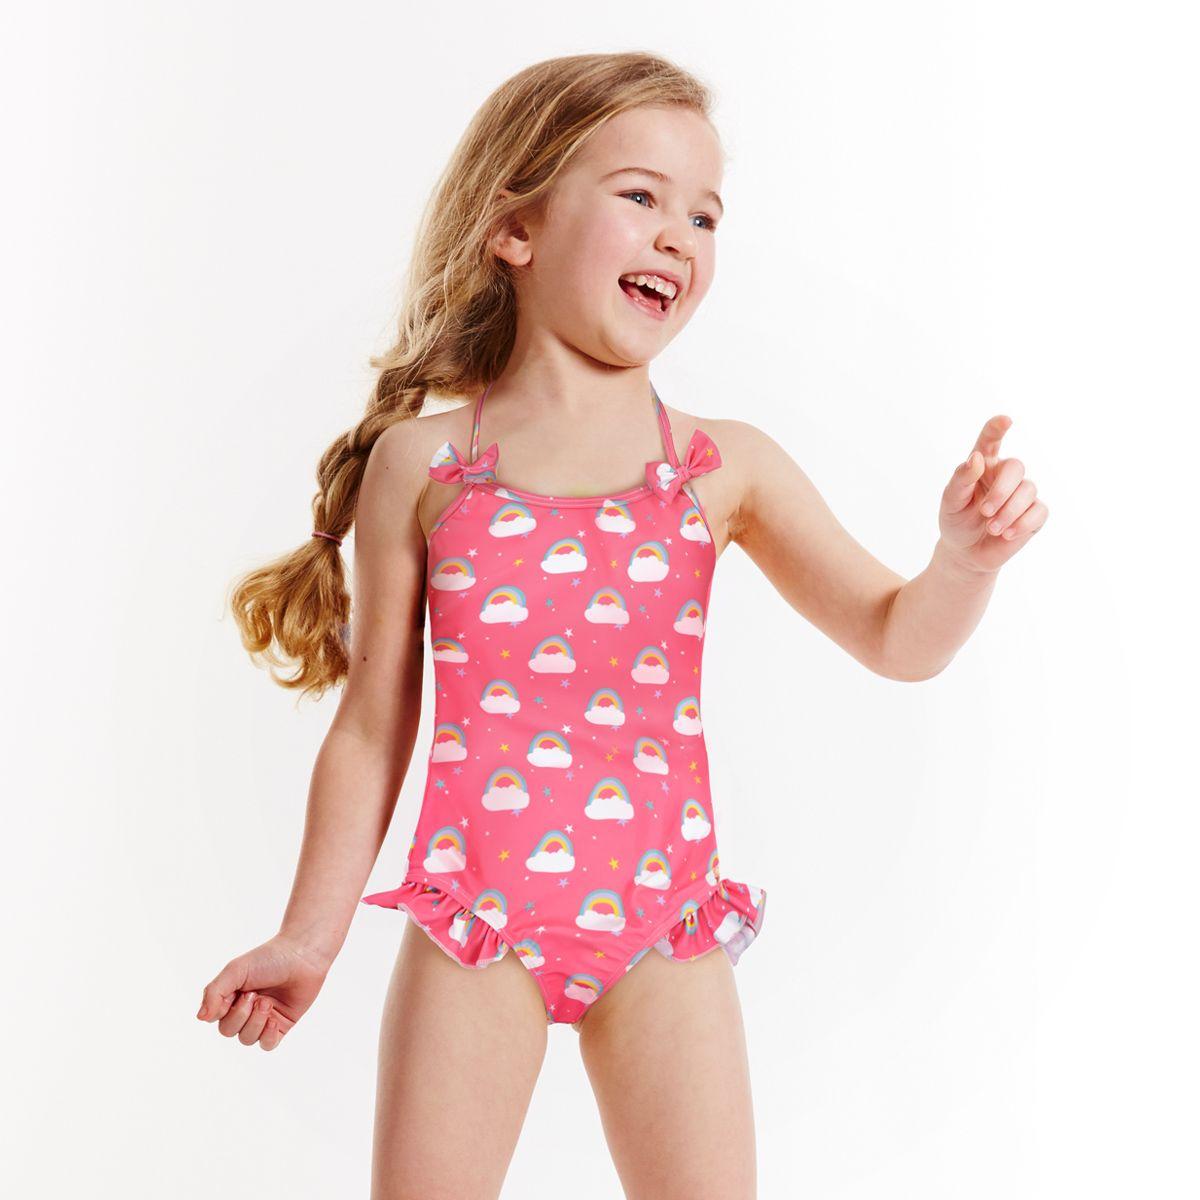 toddler swimming costume